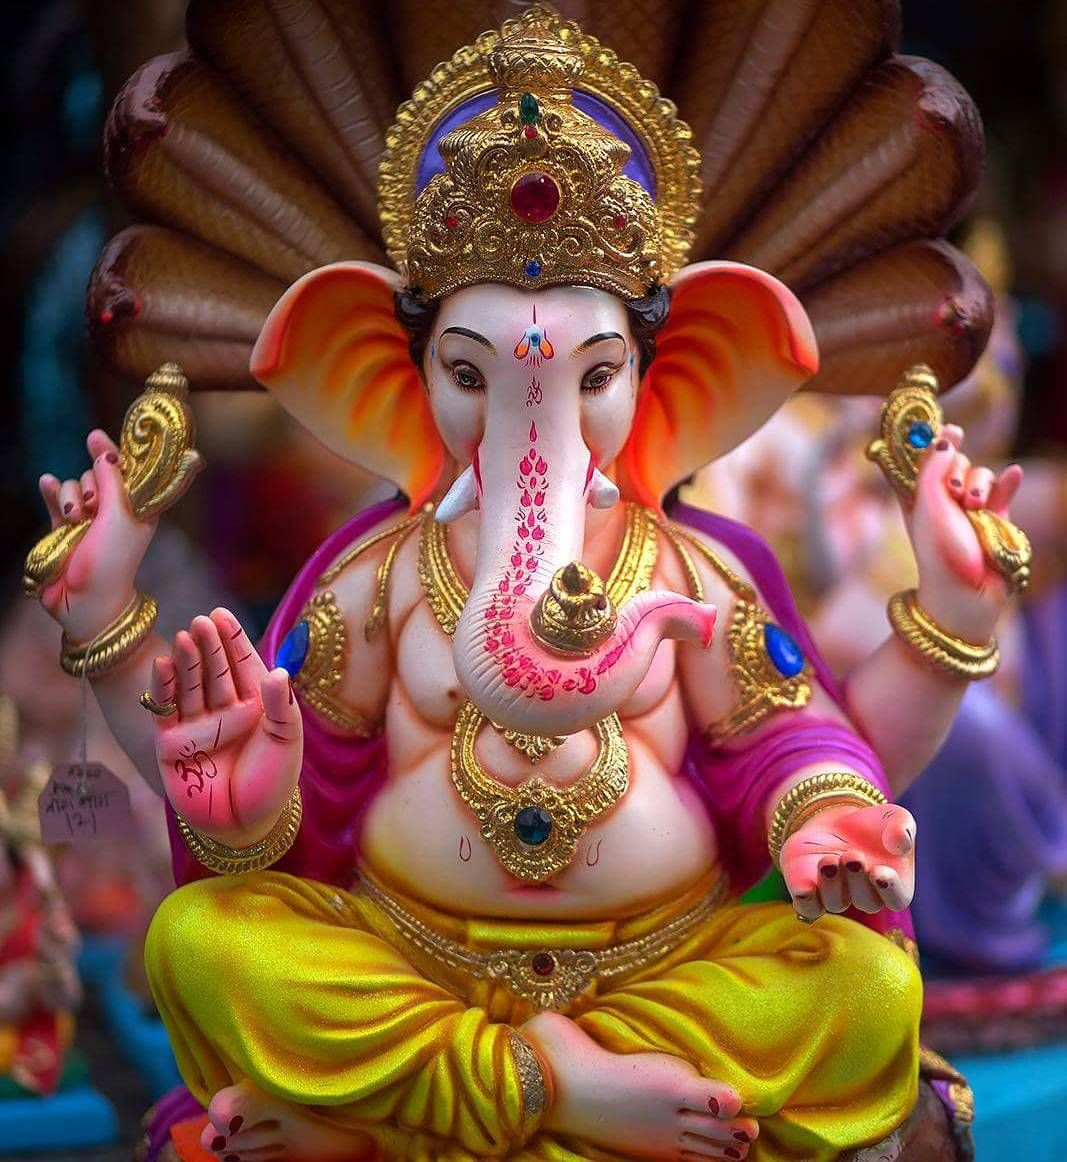 Pin by ben lautoe on ganesh ganesh chaturthi images ganesh statue ganesh - Shri ganesh hd photo ...